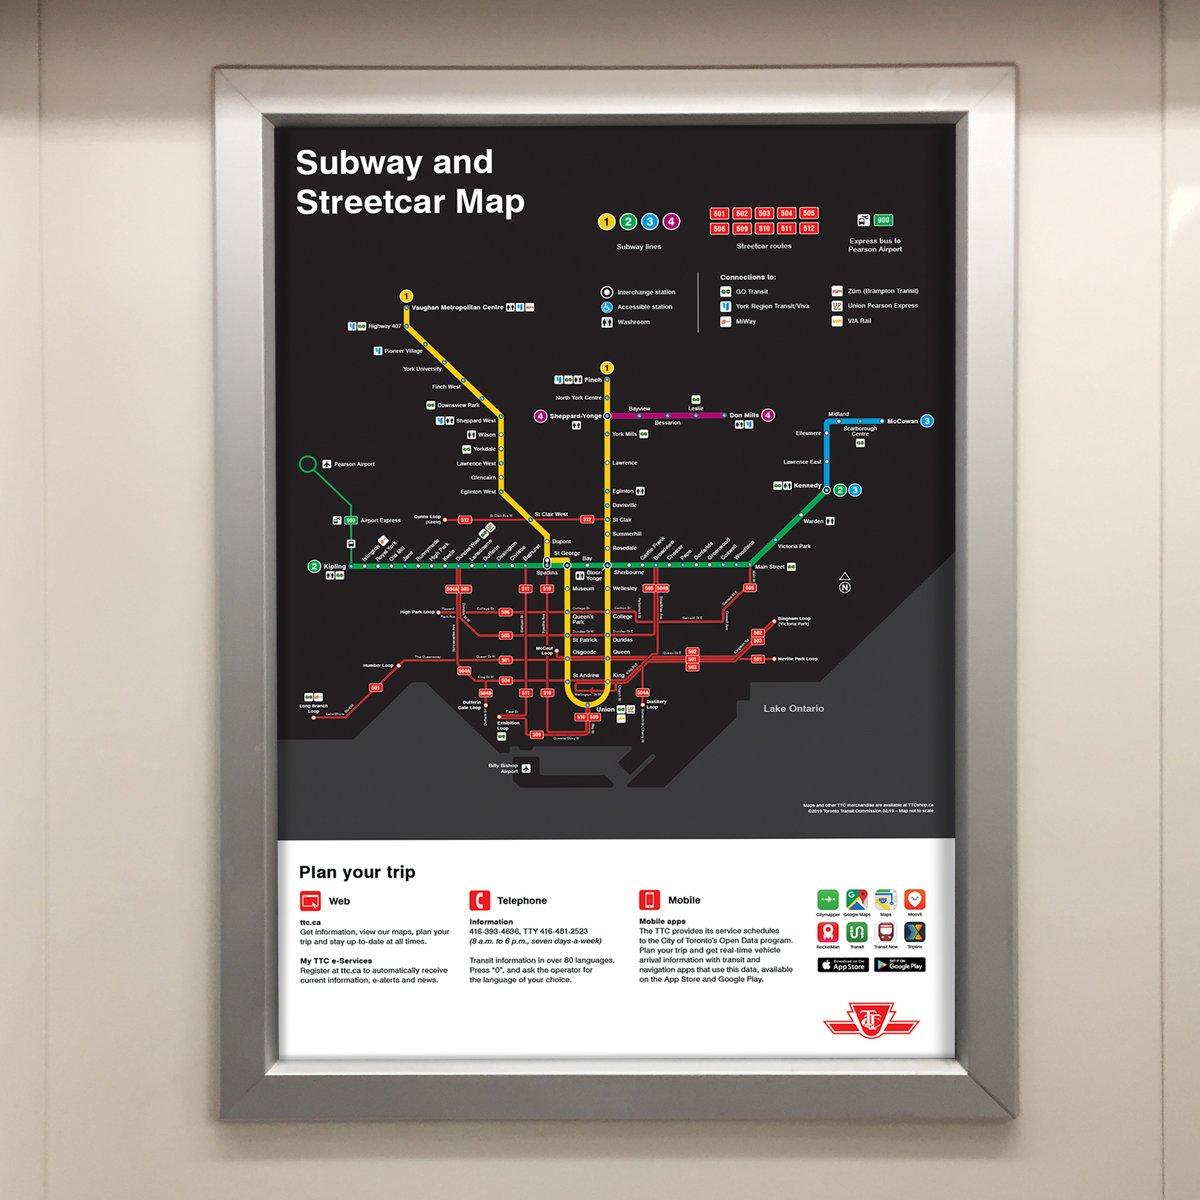 Toronto Subway Map App.Ttc Customer Service On Twitter Starting This Week You May Notice